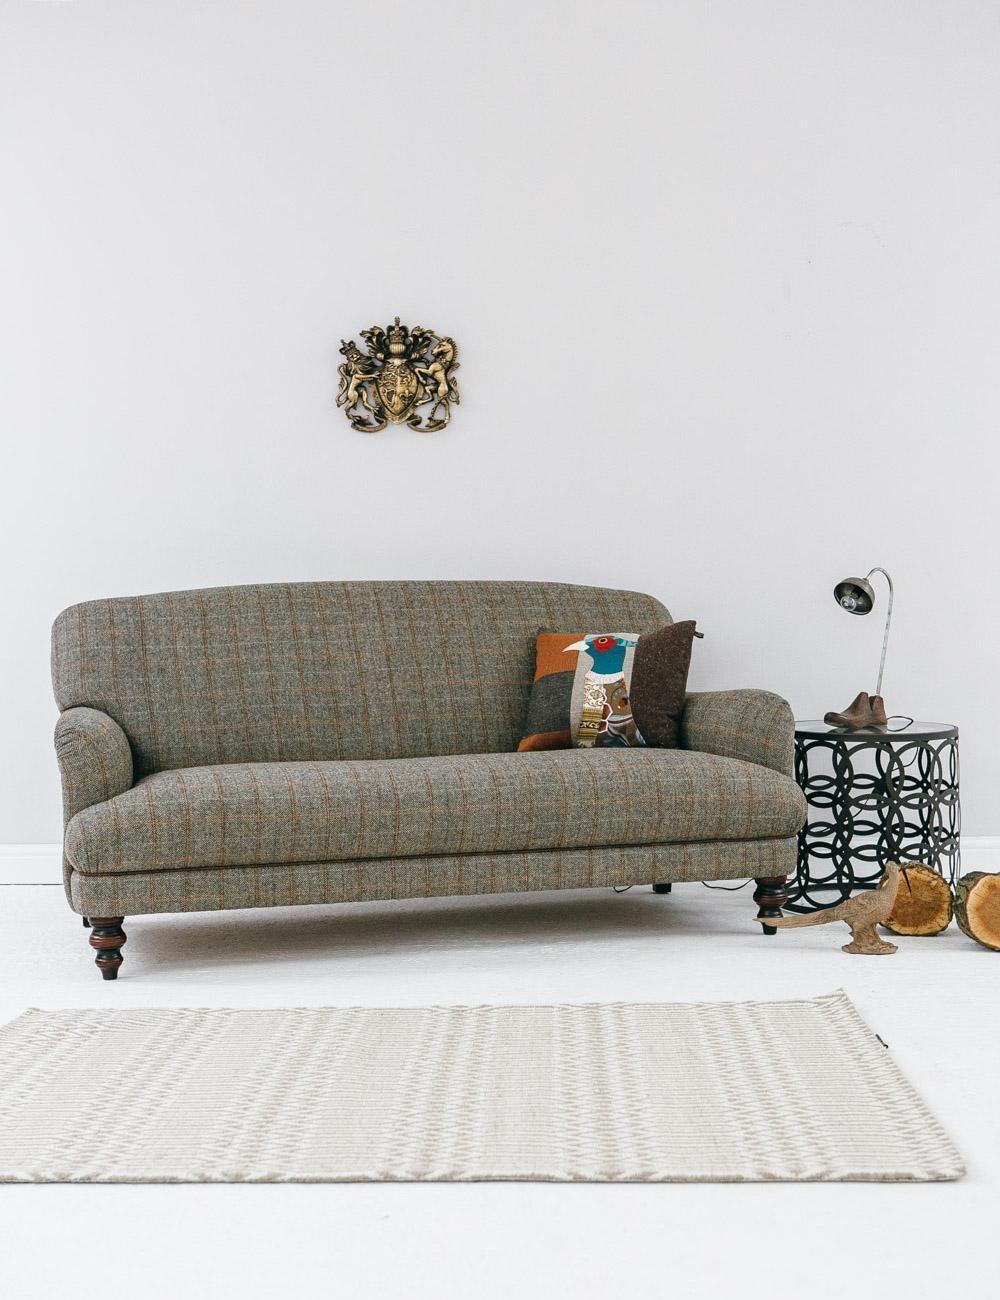 Tweed Sofa | Premier Comfort Heating Intended For Tweed Fabric Sofas (Image 15 of 20)